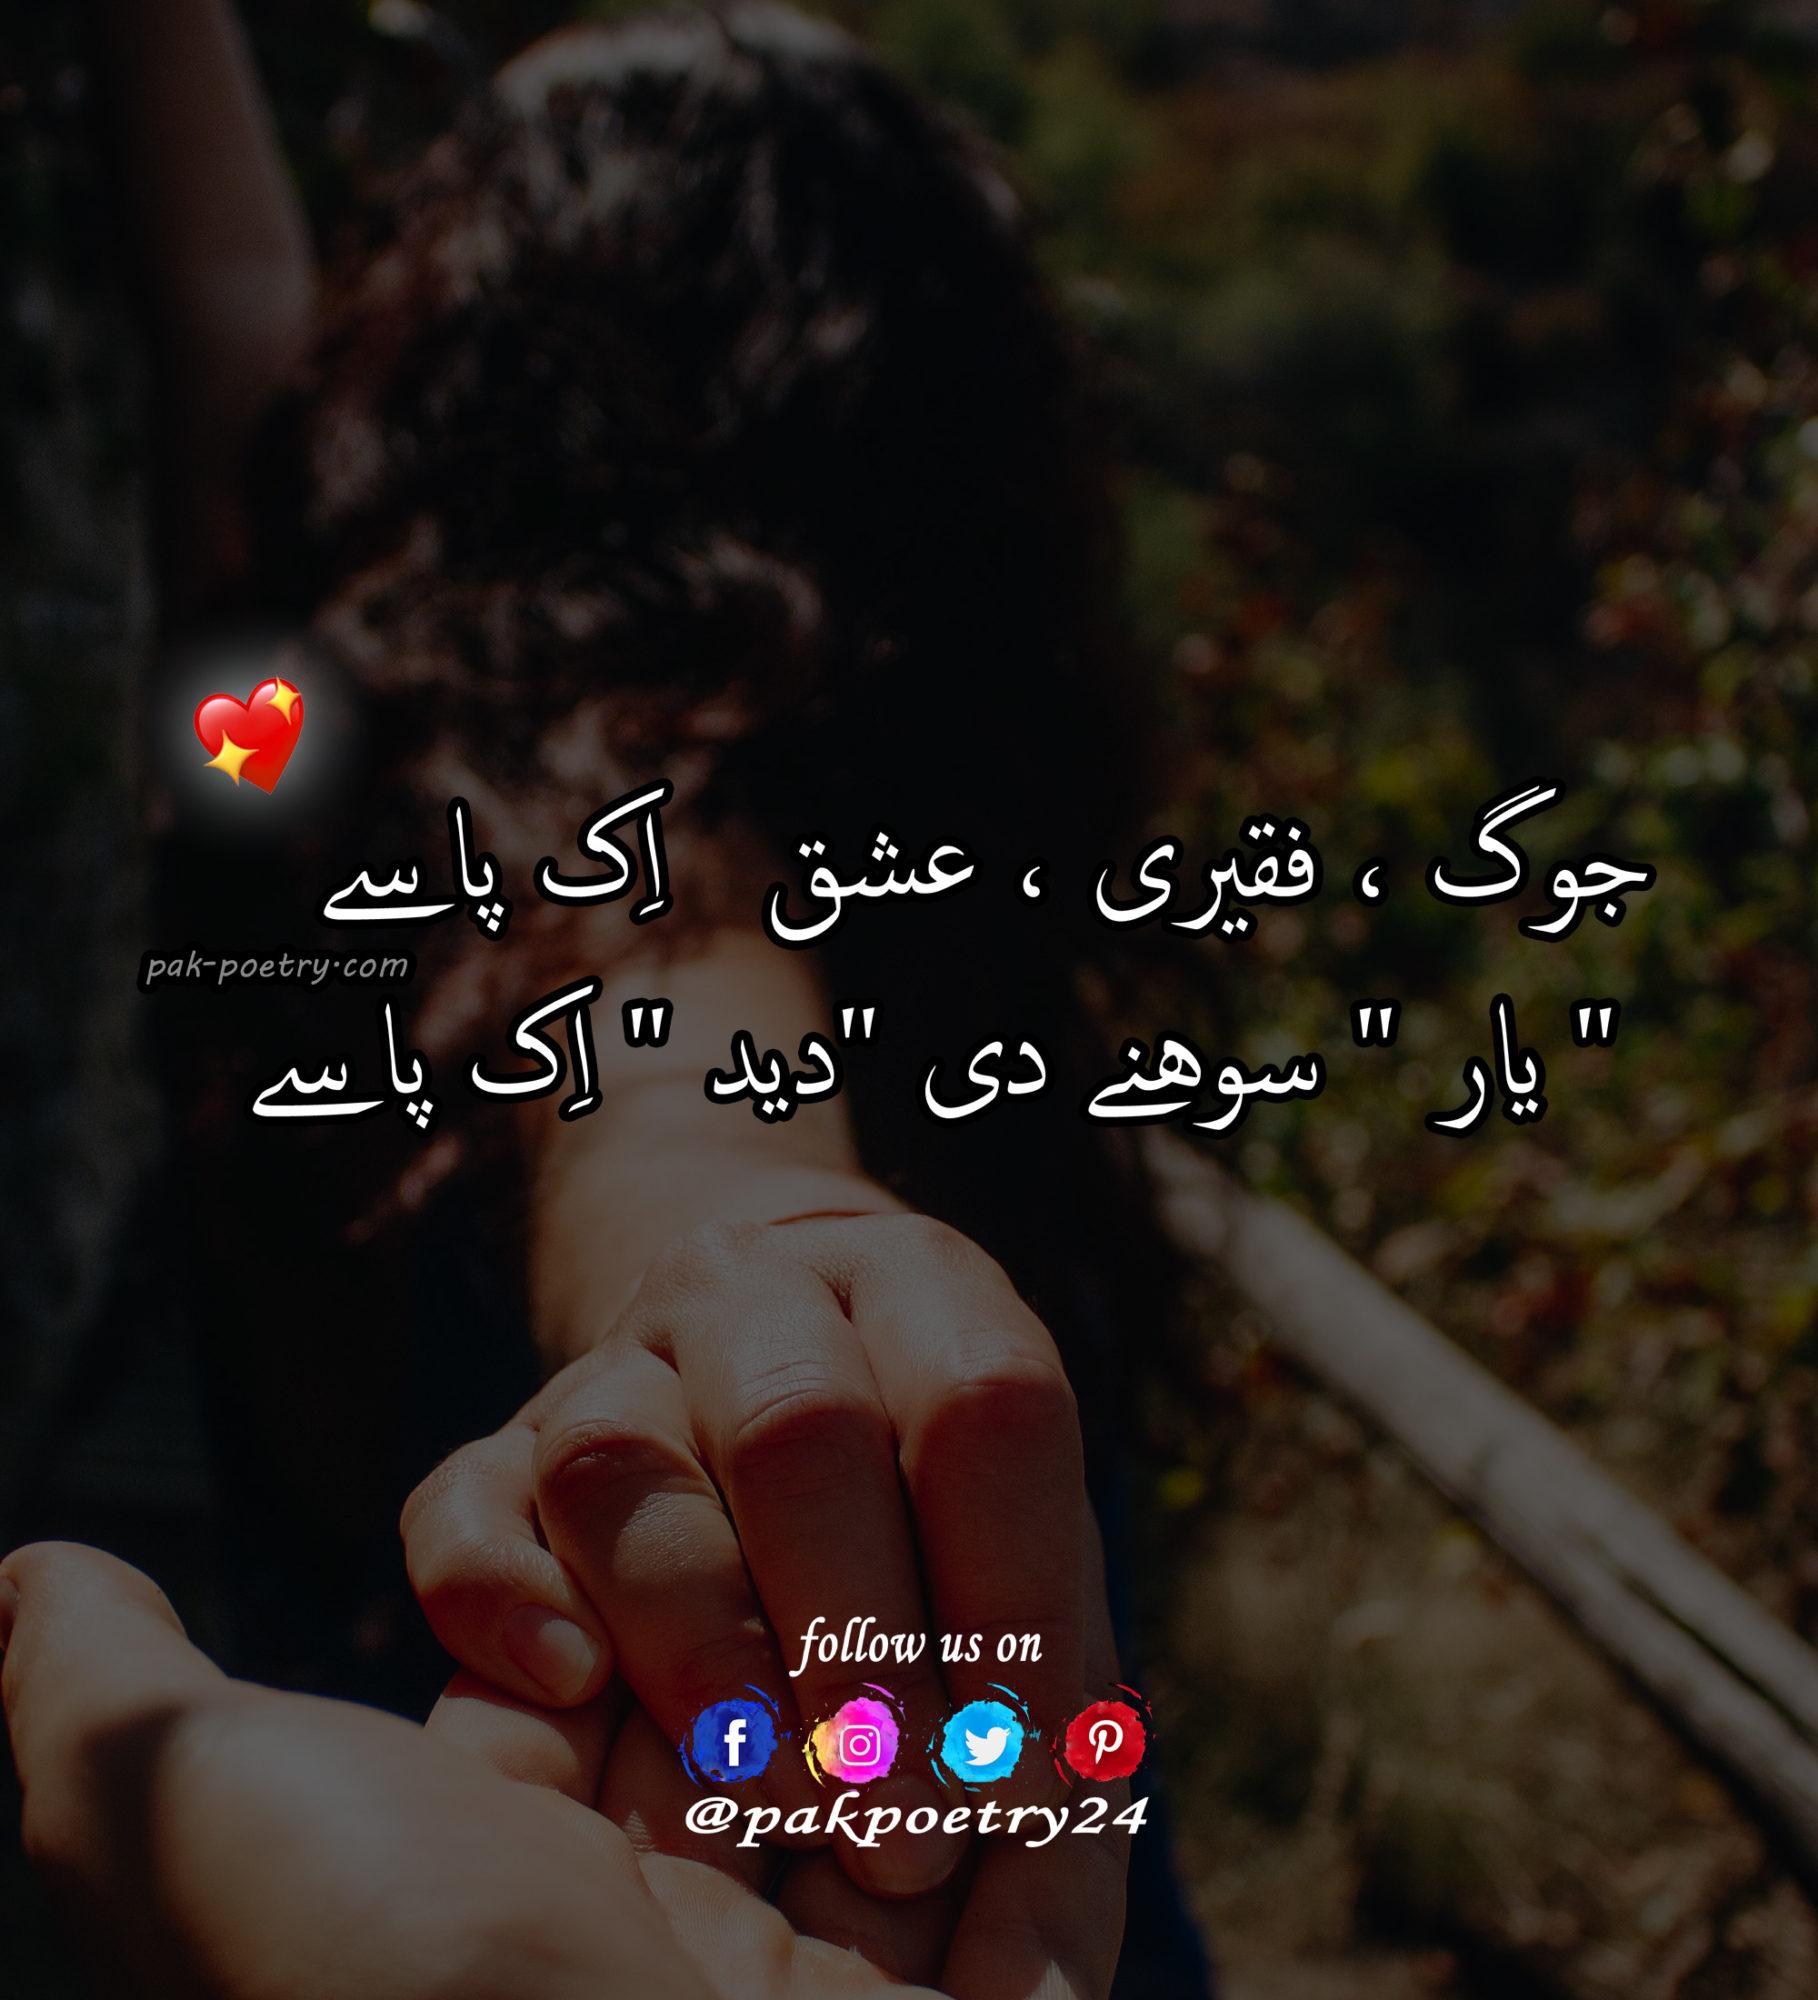 romantic poetry, urdu romantic poetry, romantic pics poetry, romantic love poetry, romantic poetry pics, Love poetry, love poetry in urdu, love poetry urdu, urdu love poetry, poetry love, love poetry pics, love poetries, lovepoetry, Poetry in urdu, urdu poetry, poetry urdu, punjabi poetry,